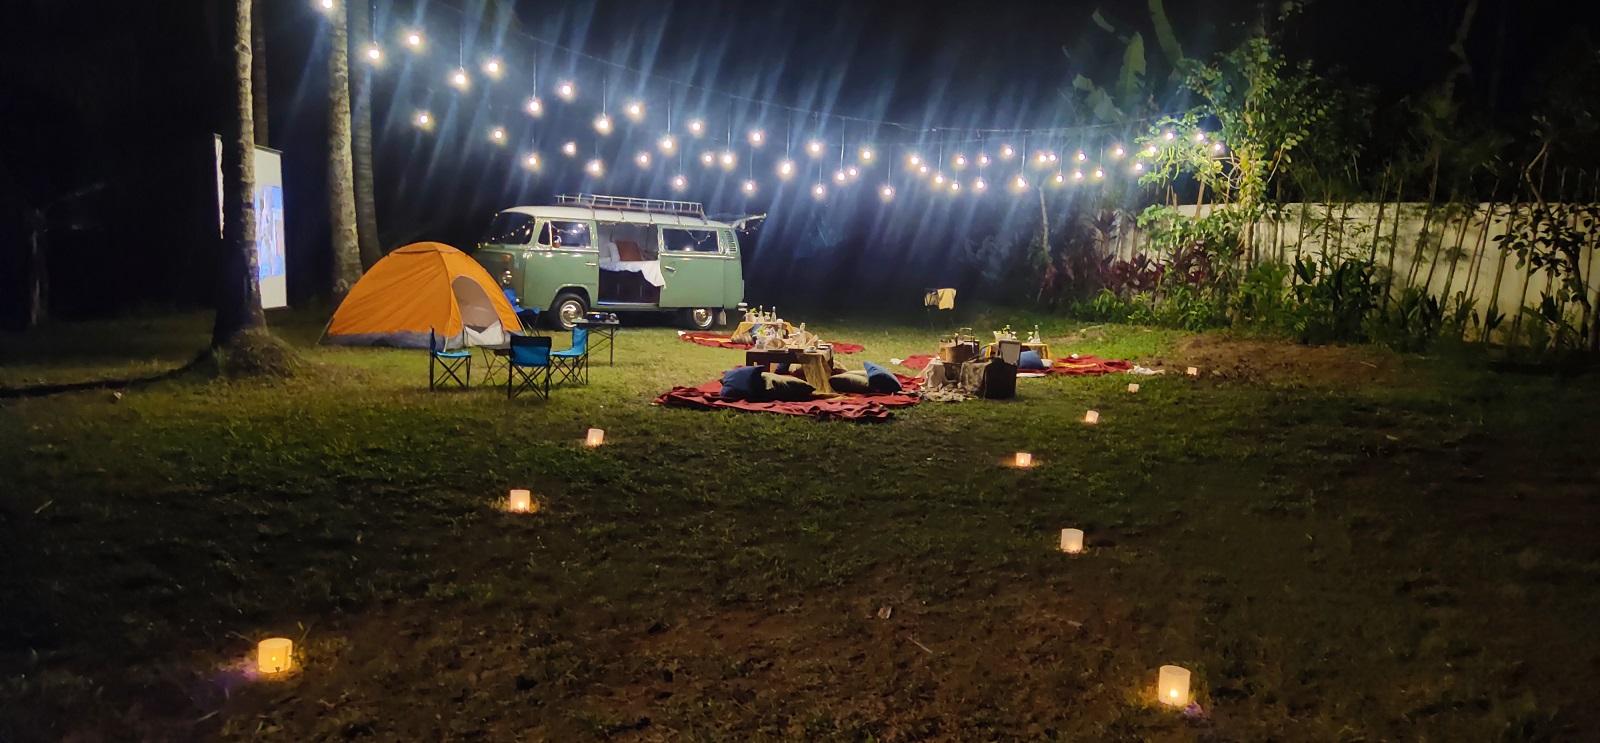 Campervan Picnic Under The Stars